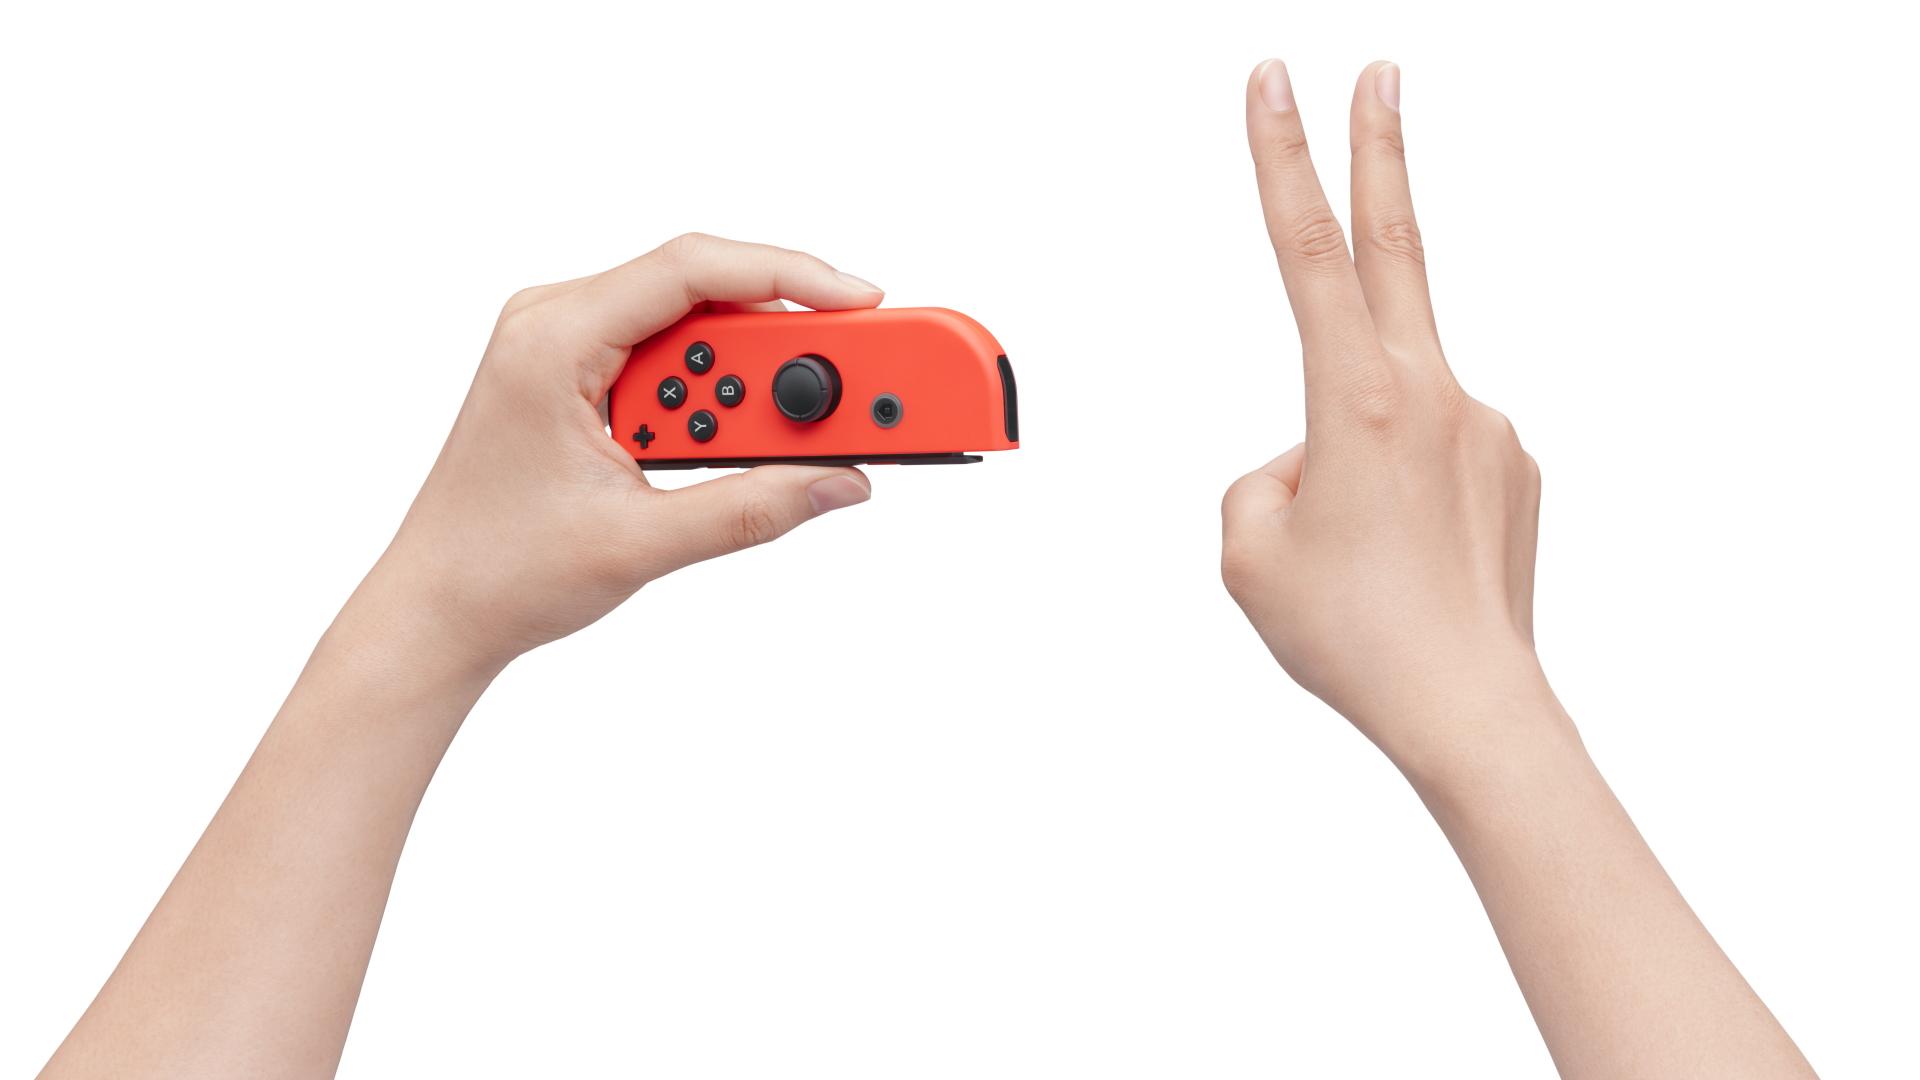 Using the Joy-Con IR Sensors for Nintendo Switch Brain Training